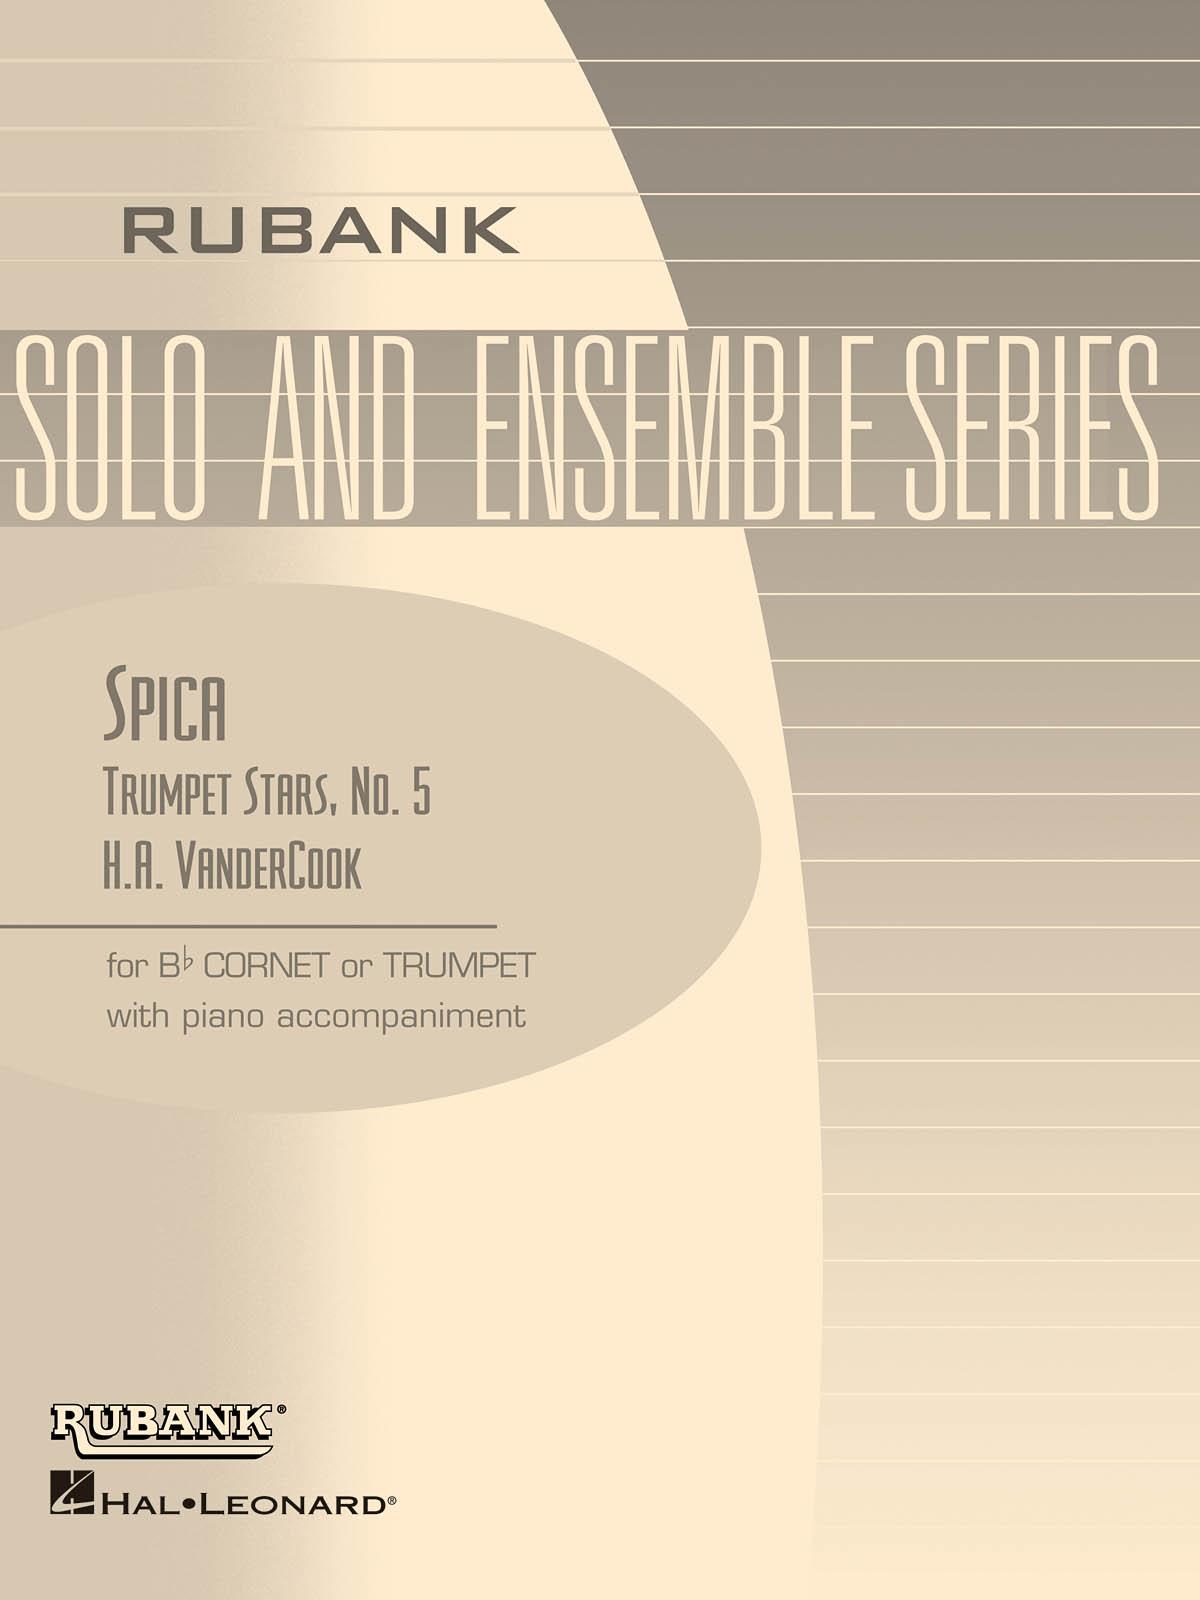 H.A. VanderCook: Spica (Trumpet Stars No. 5): Trumpet and Accomp.: Instrumental